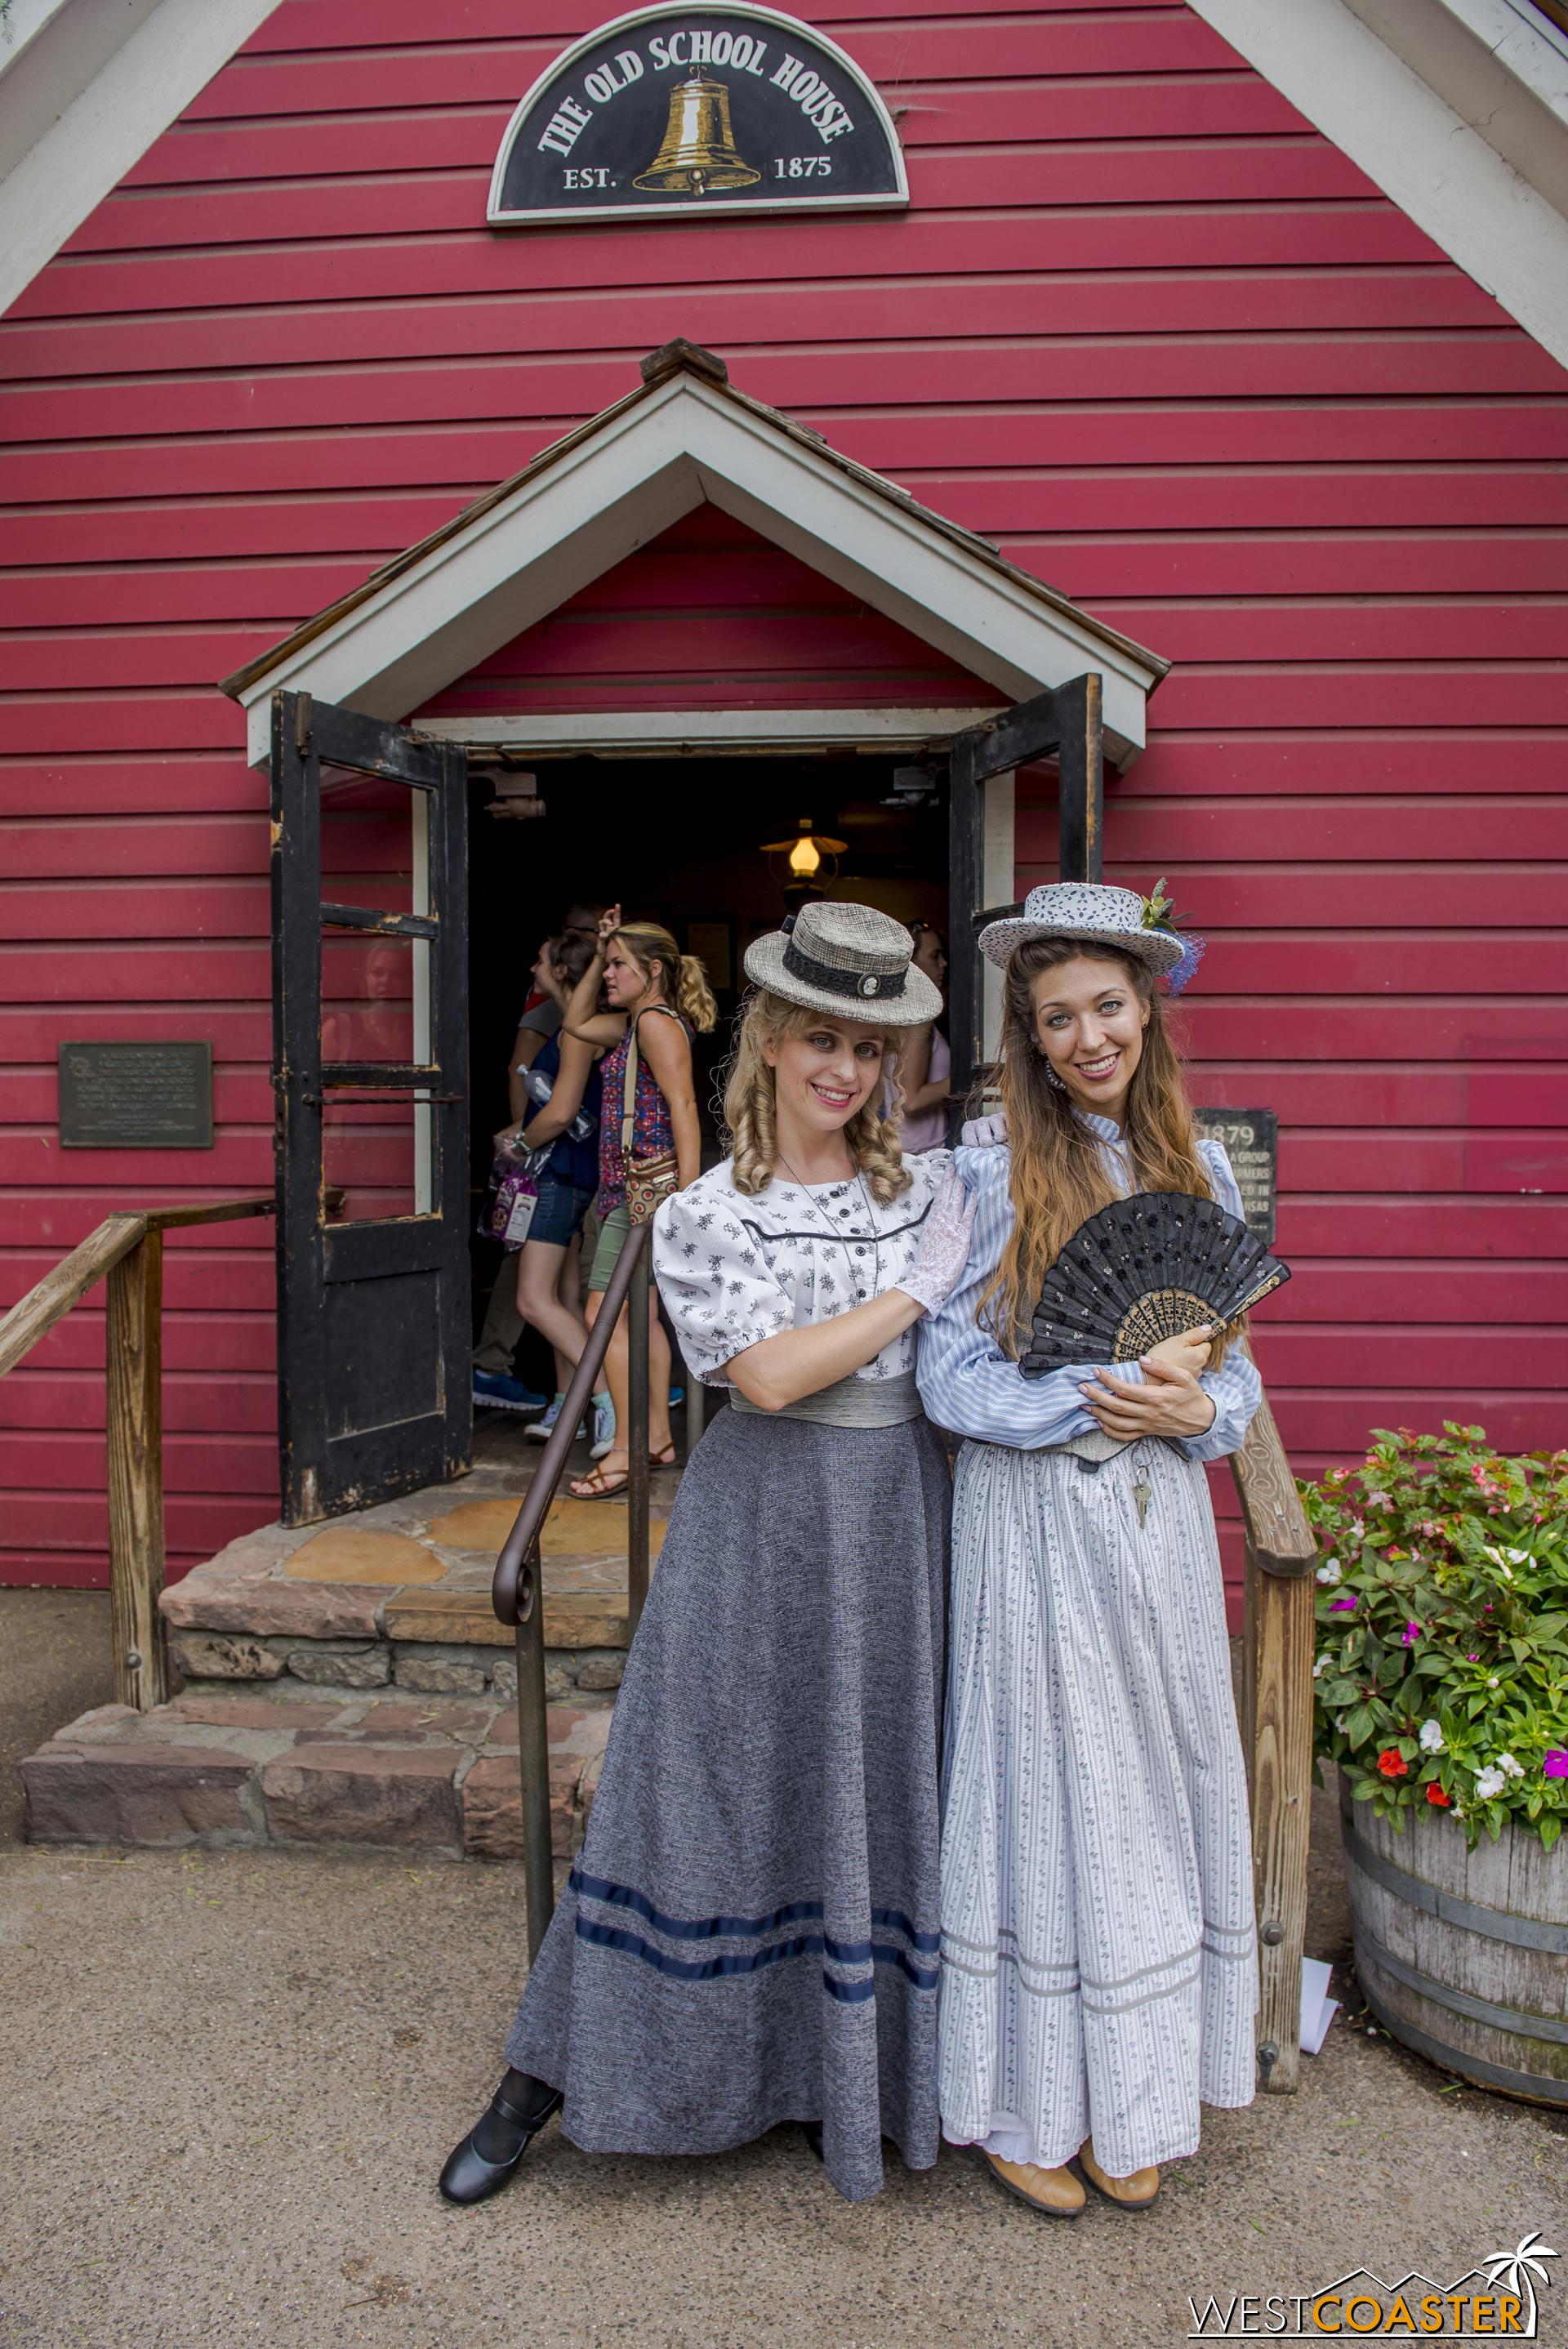 Schoolteacher Abbie McBride (left) and Miss Sierra pose outside the Calico Schoolhouse.